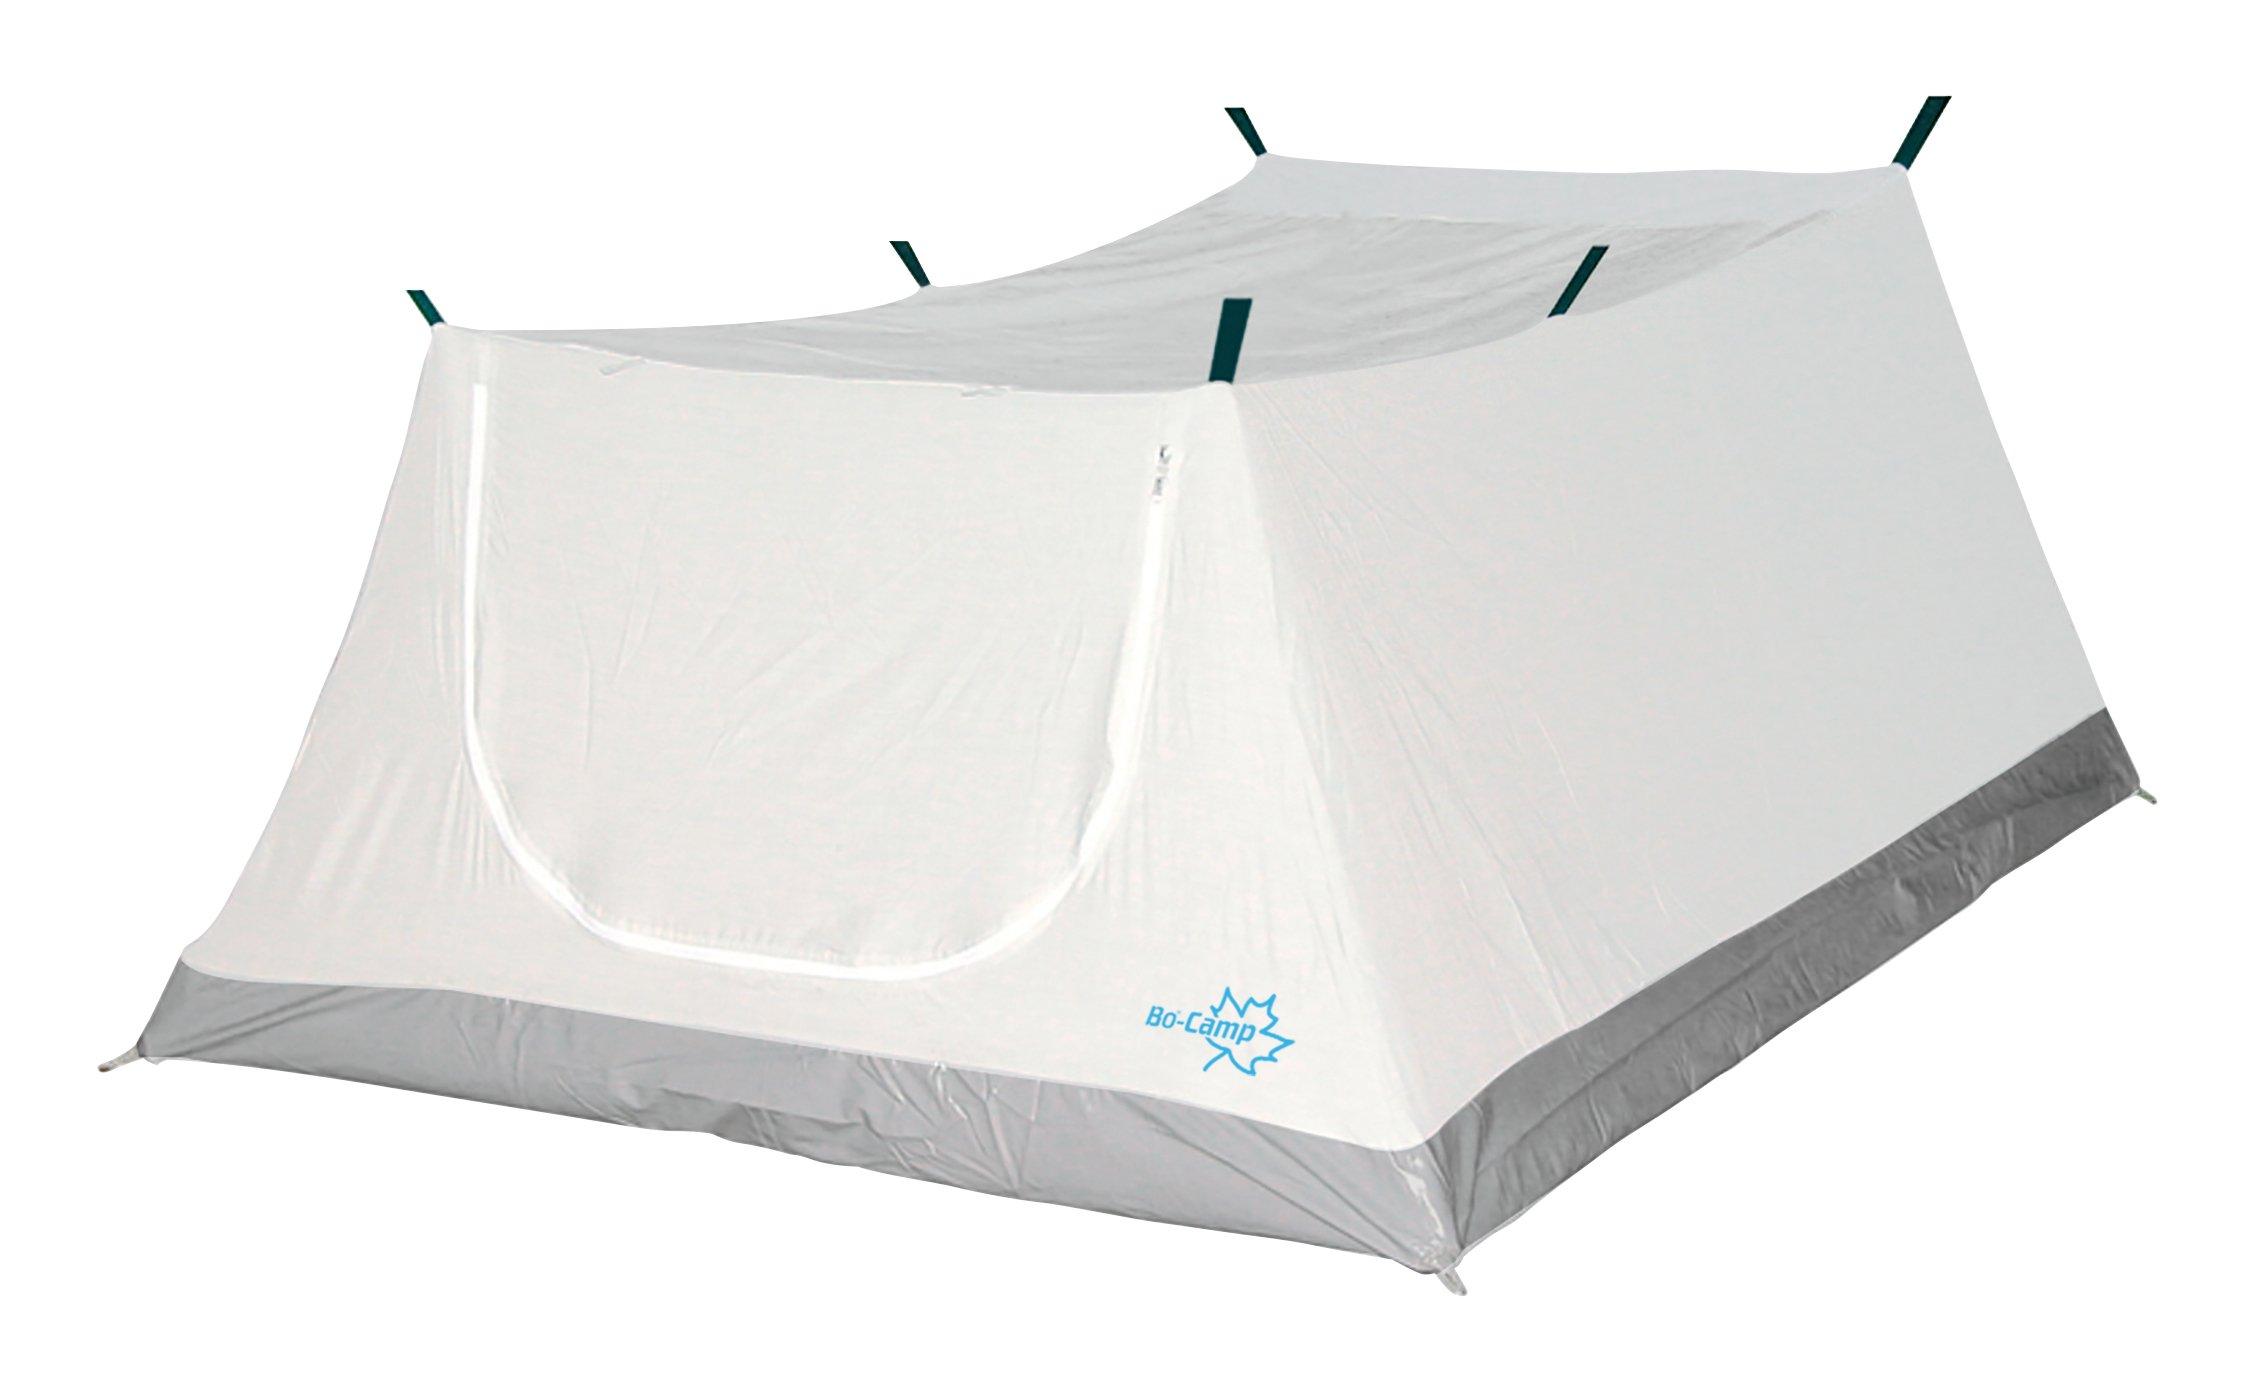 Bo-Camp - Bottom tent - Folding caravan 1